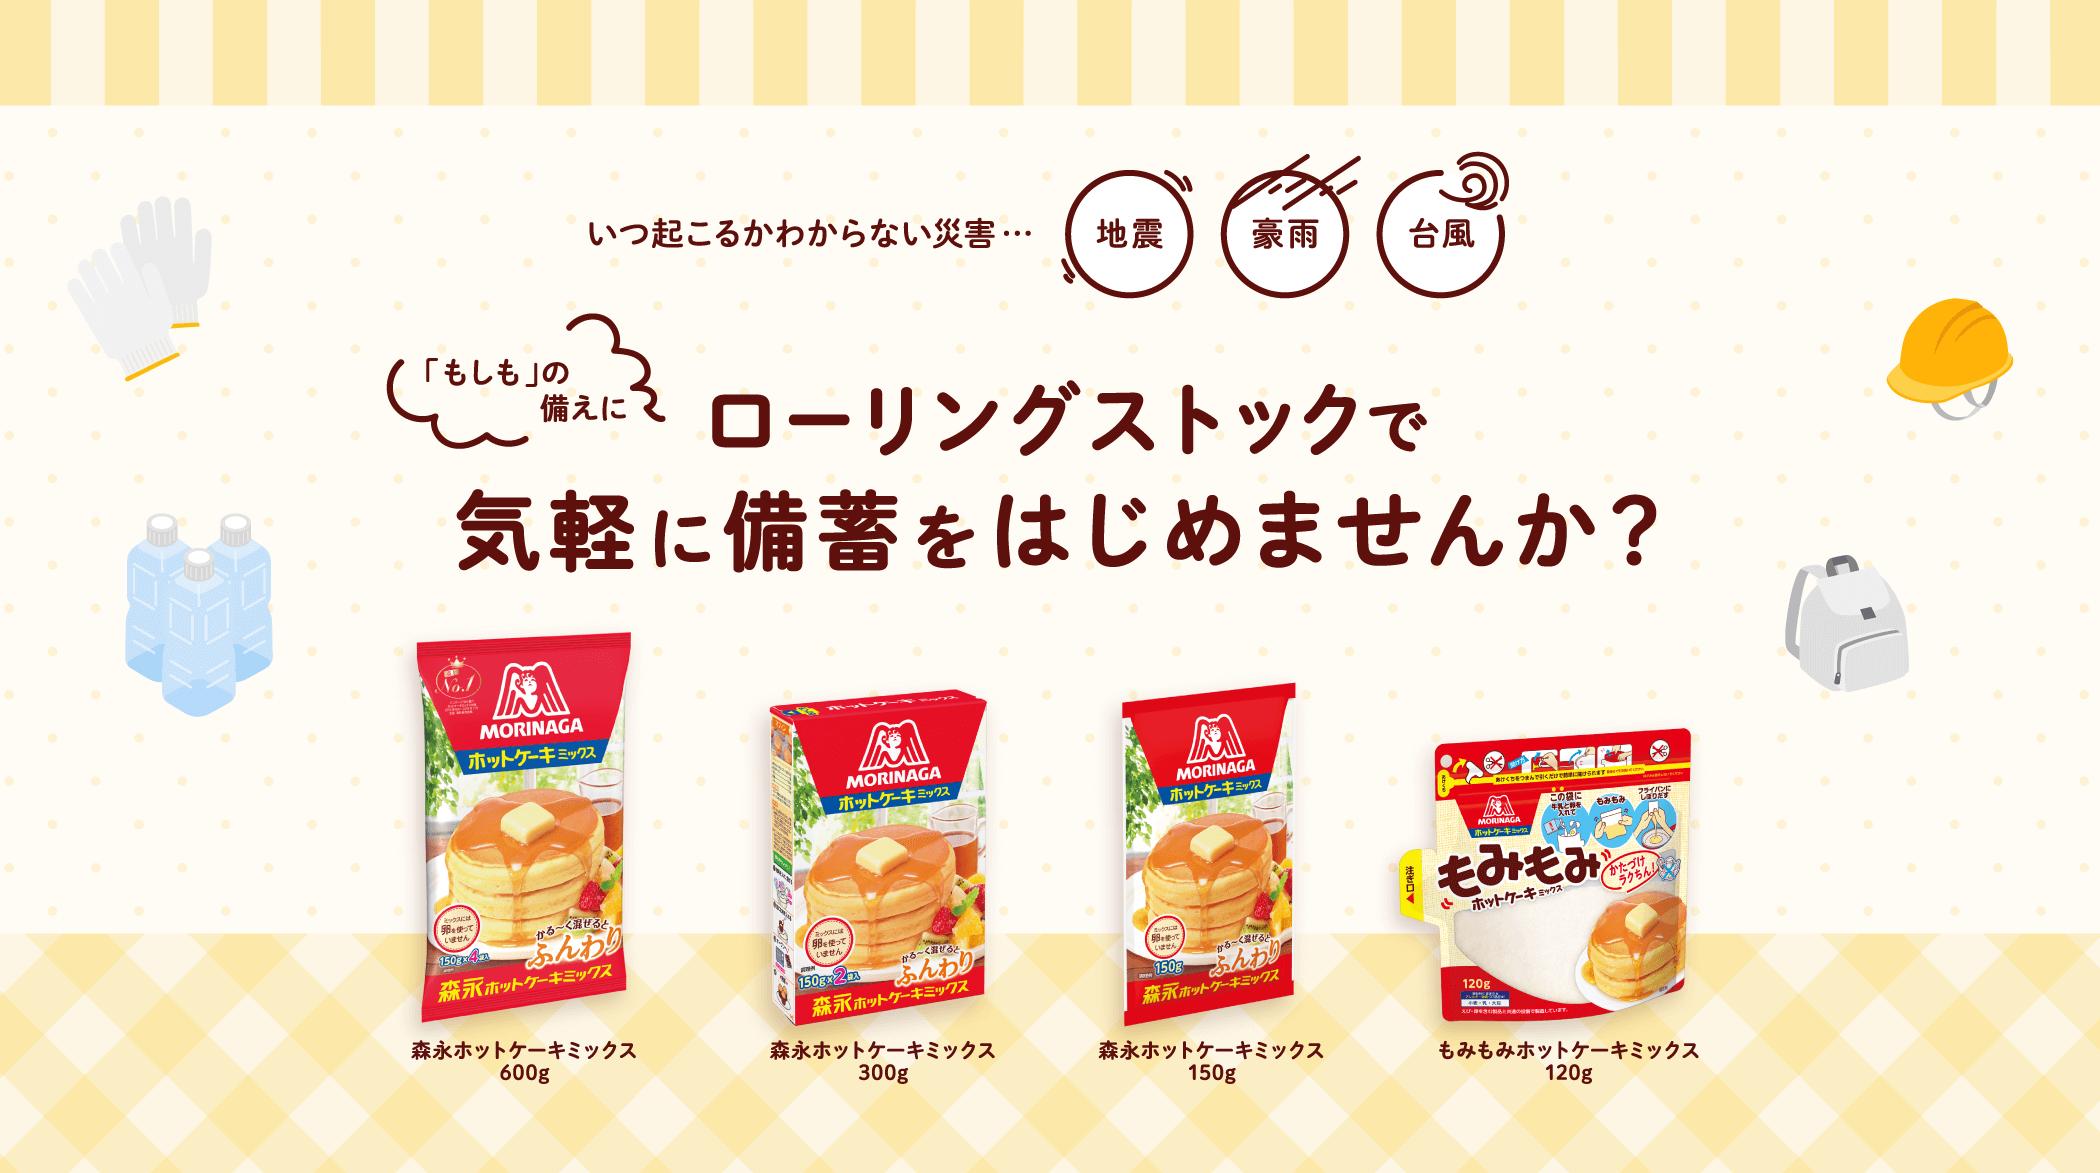 https://www.morinaga.co.jp/hotcake/bousai/assets/images/kv.png